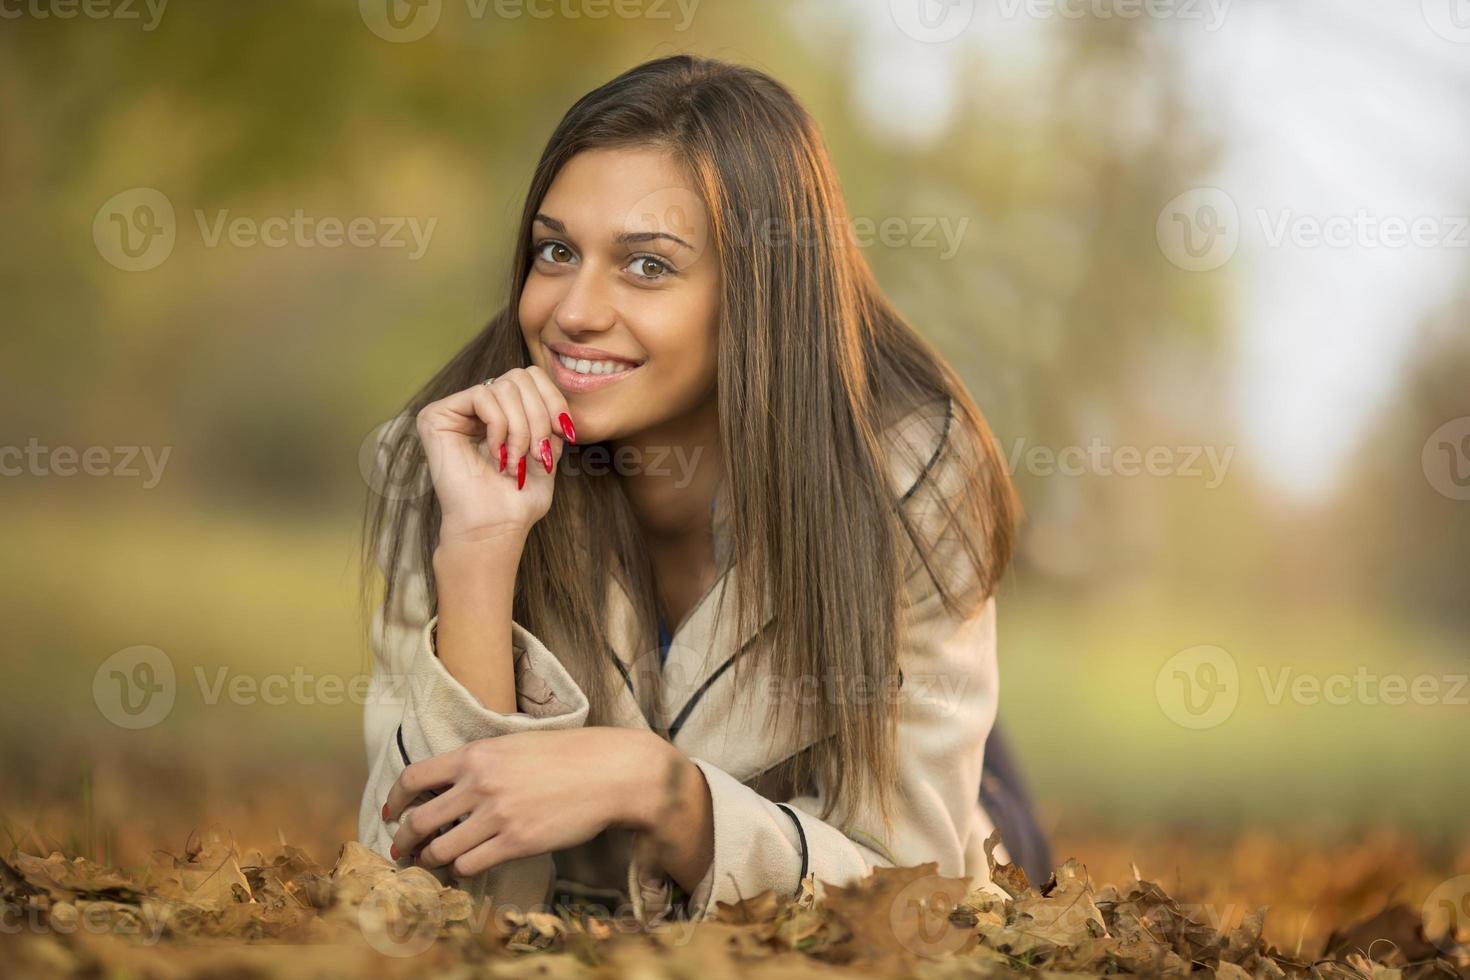 Girl in autumn photo